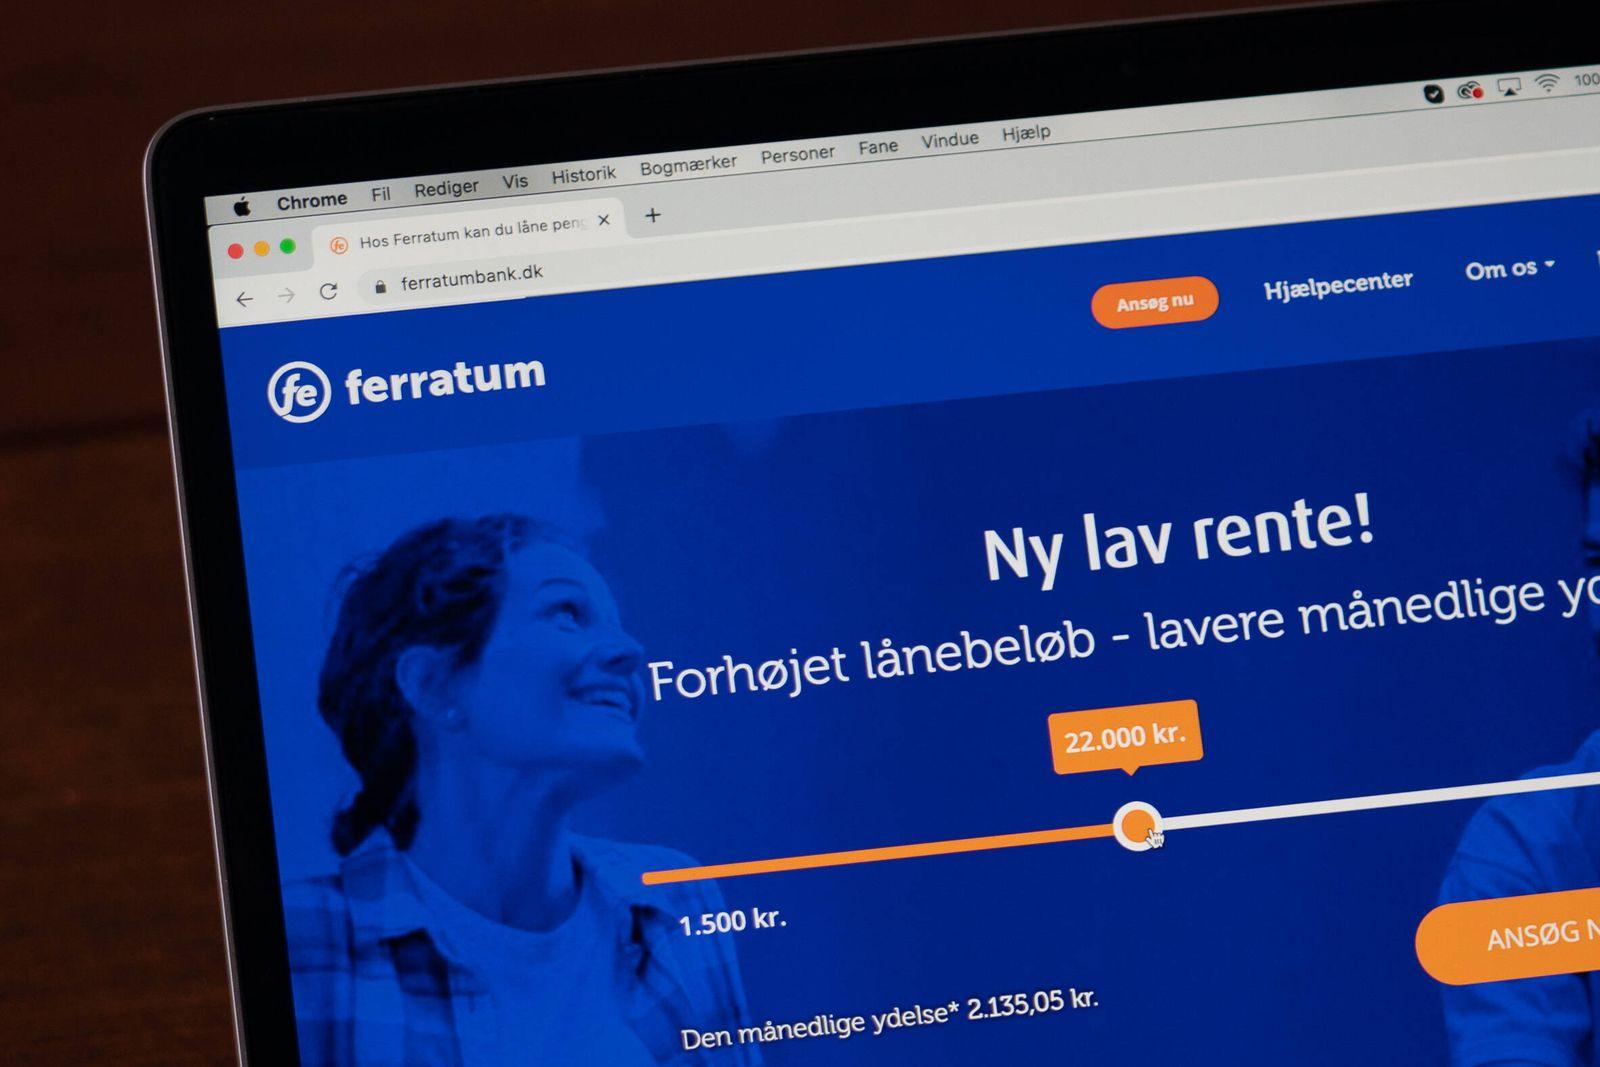 Laaneudbyderen Ferratum paa www.ferratumbank.dk paa Macbook Pro mandag den 21. september 2020.. , Copenhagen Denmark ***